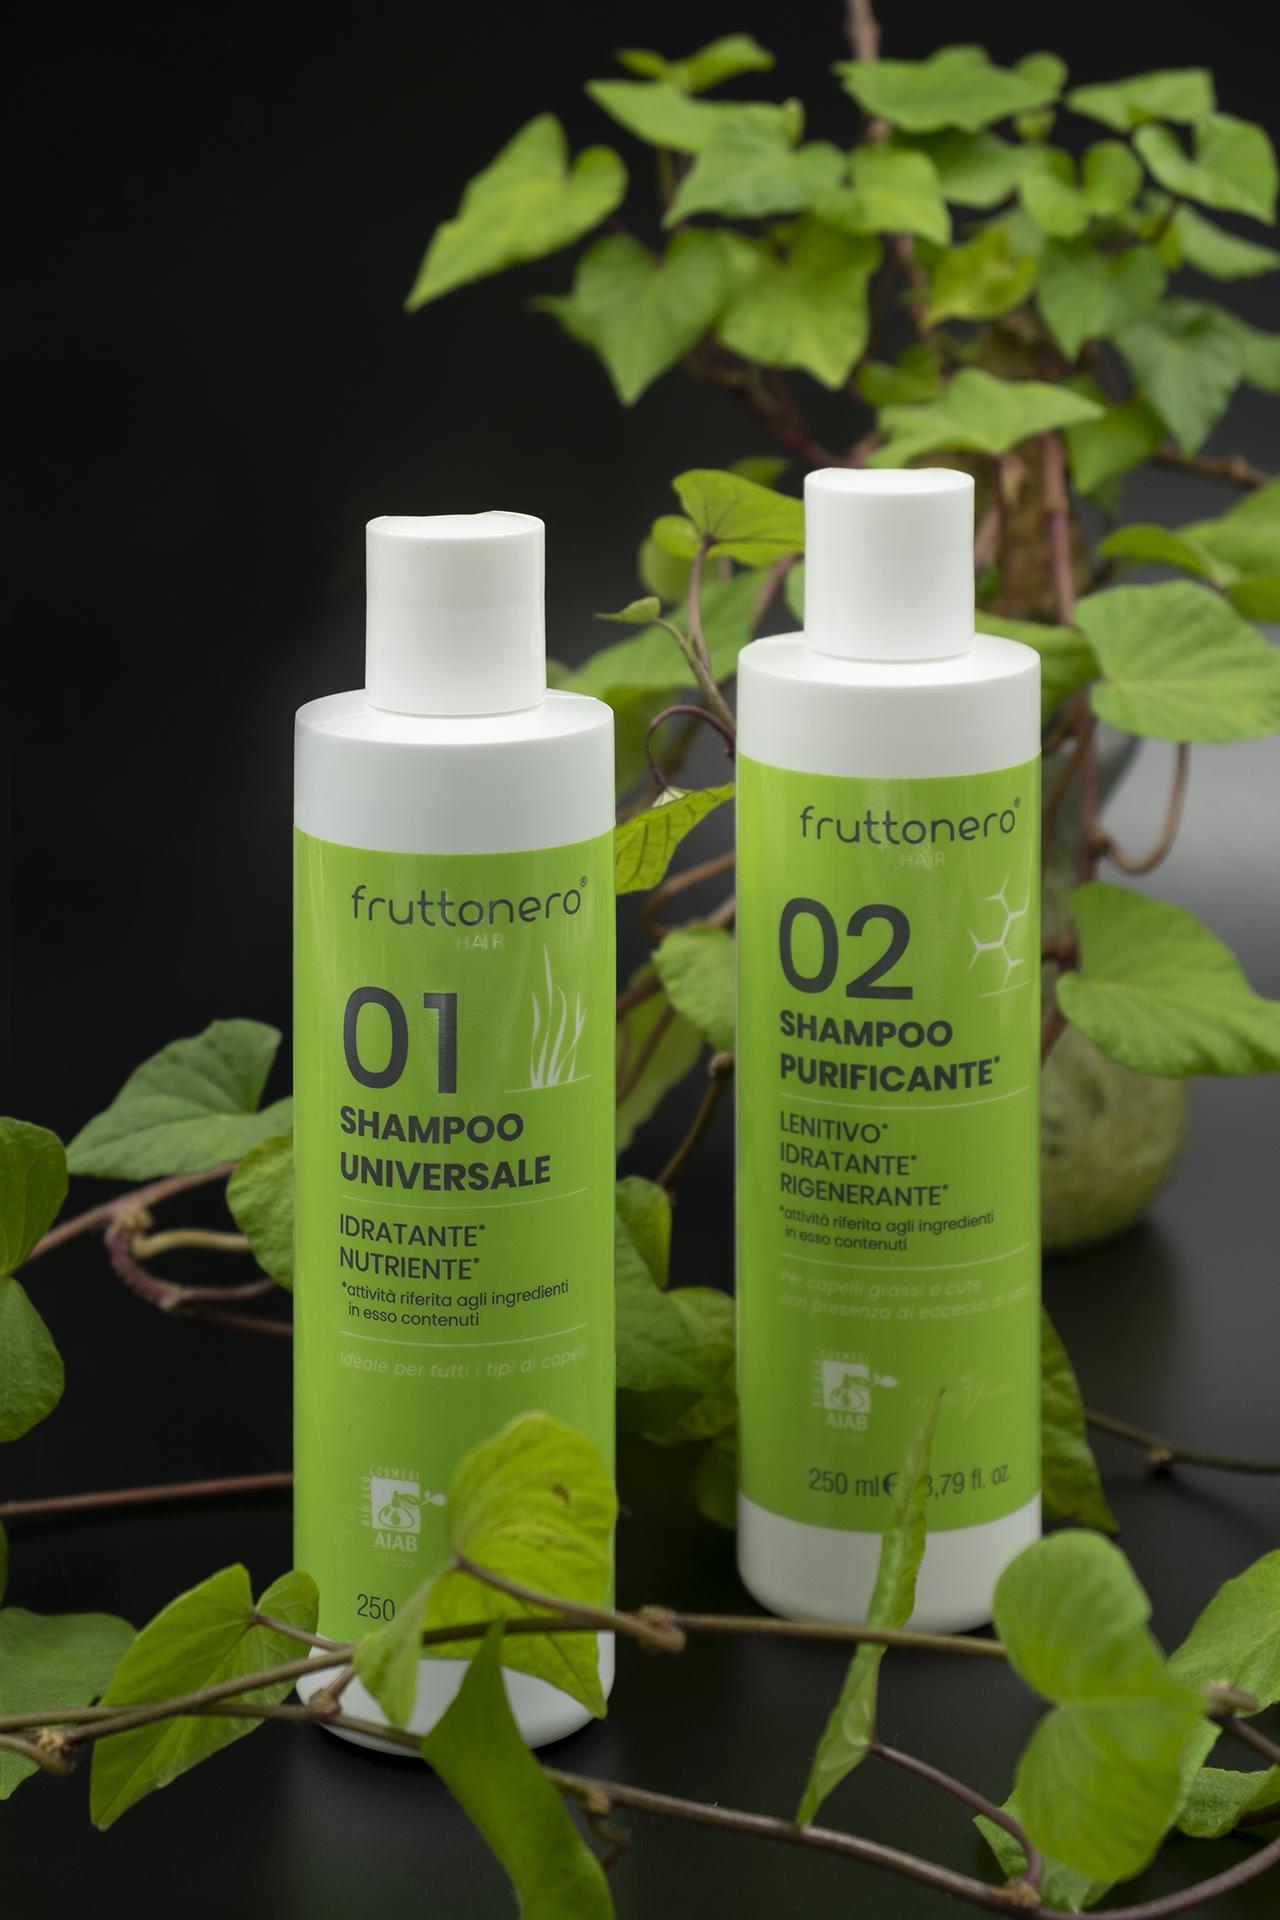 shampoo fruttonero